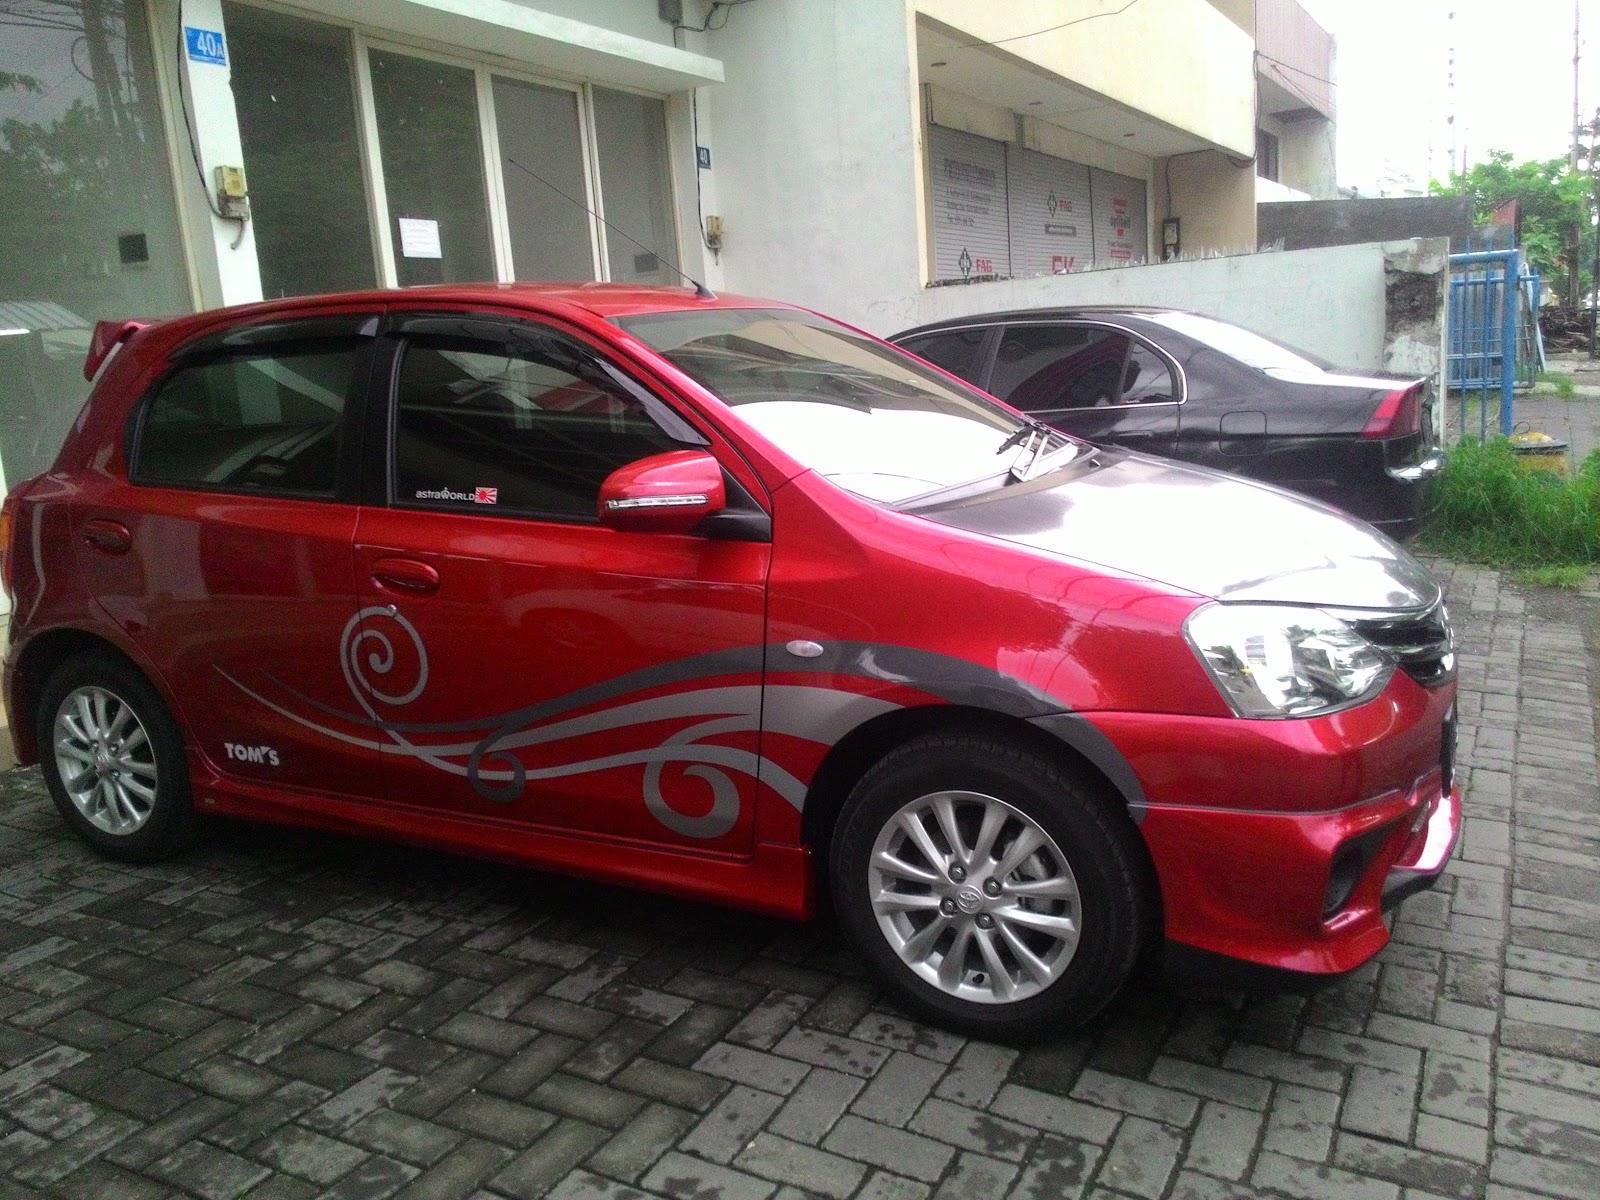 Modifikasi Mobil Avanza Merah Marun Modifikasi Style